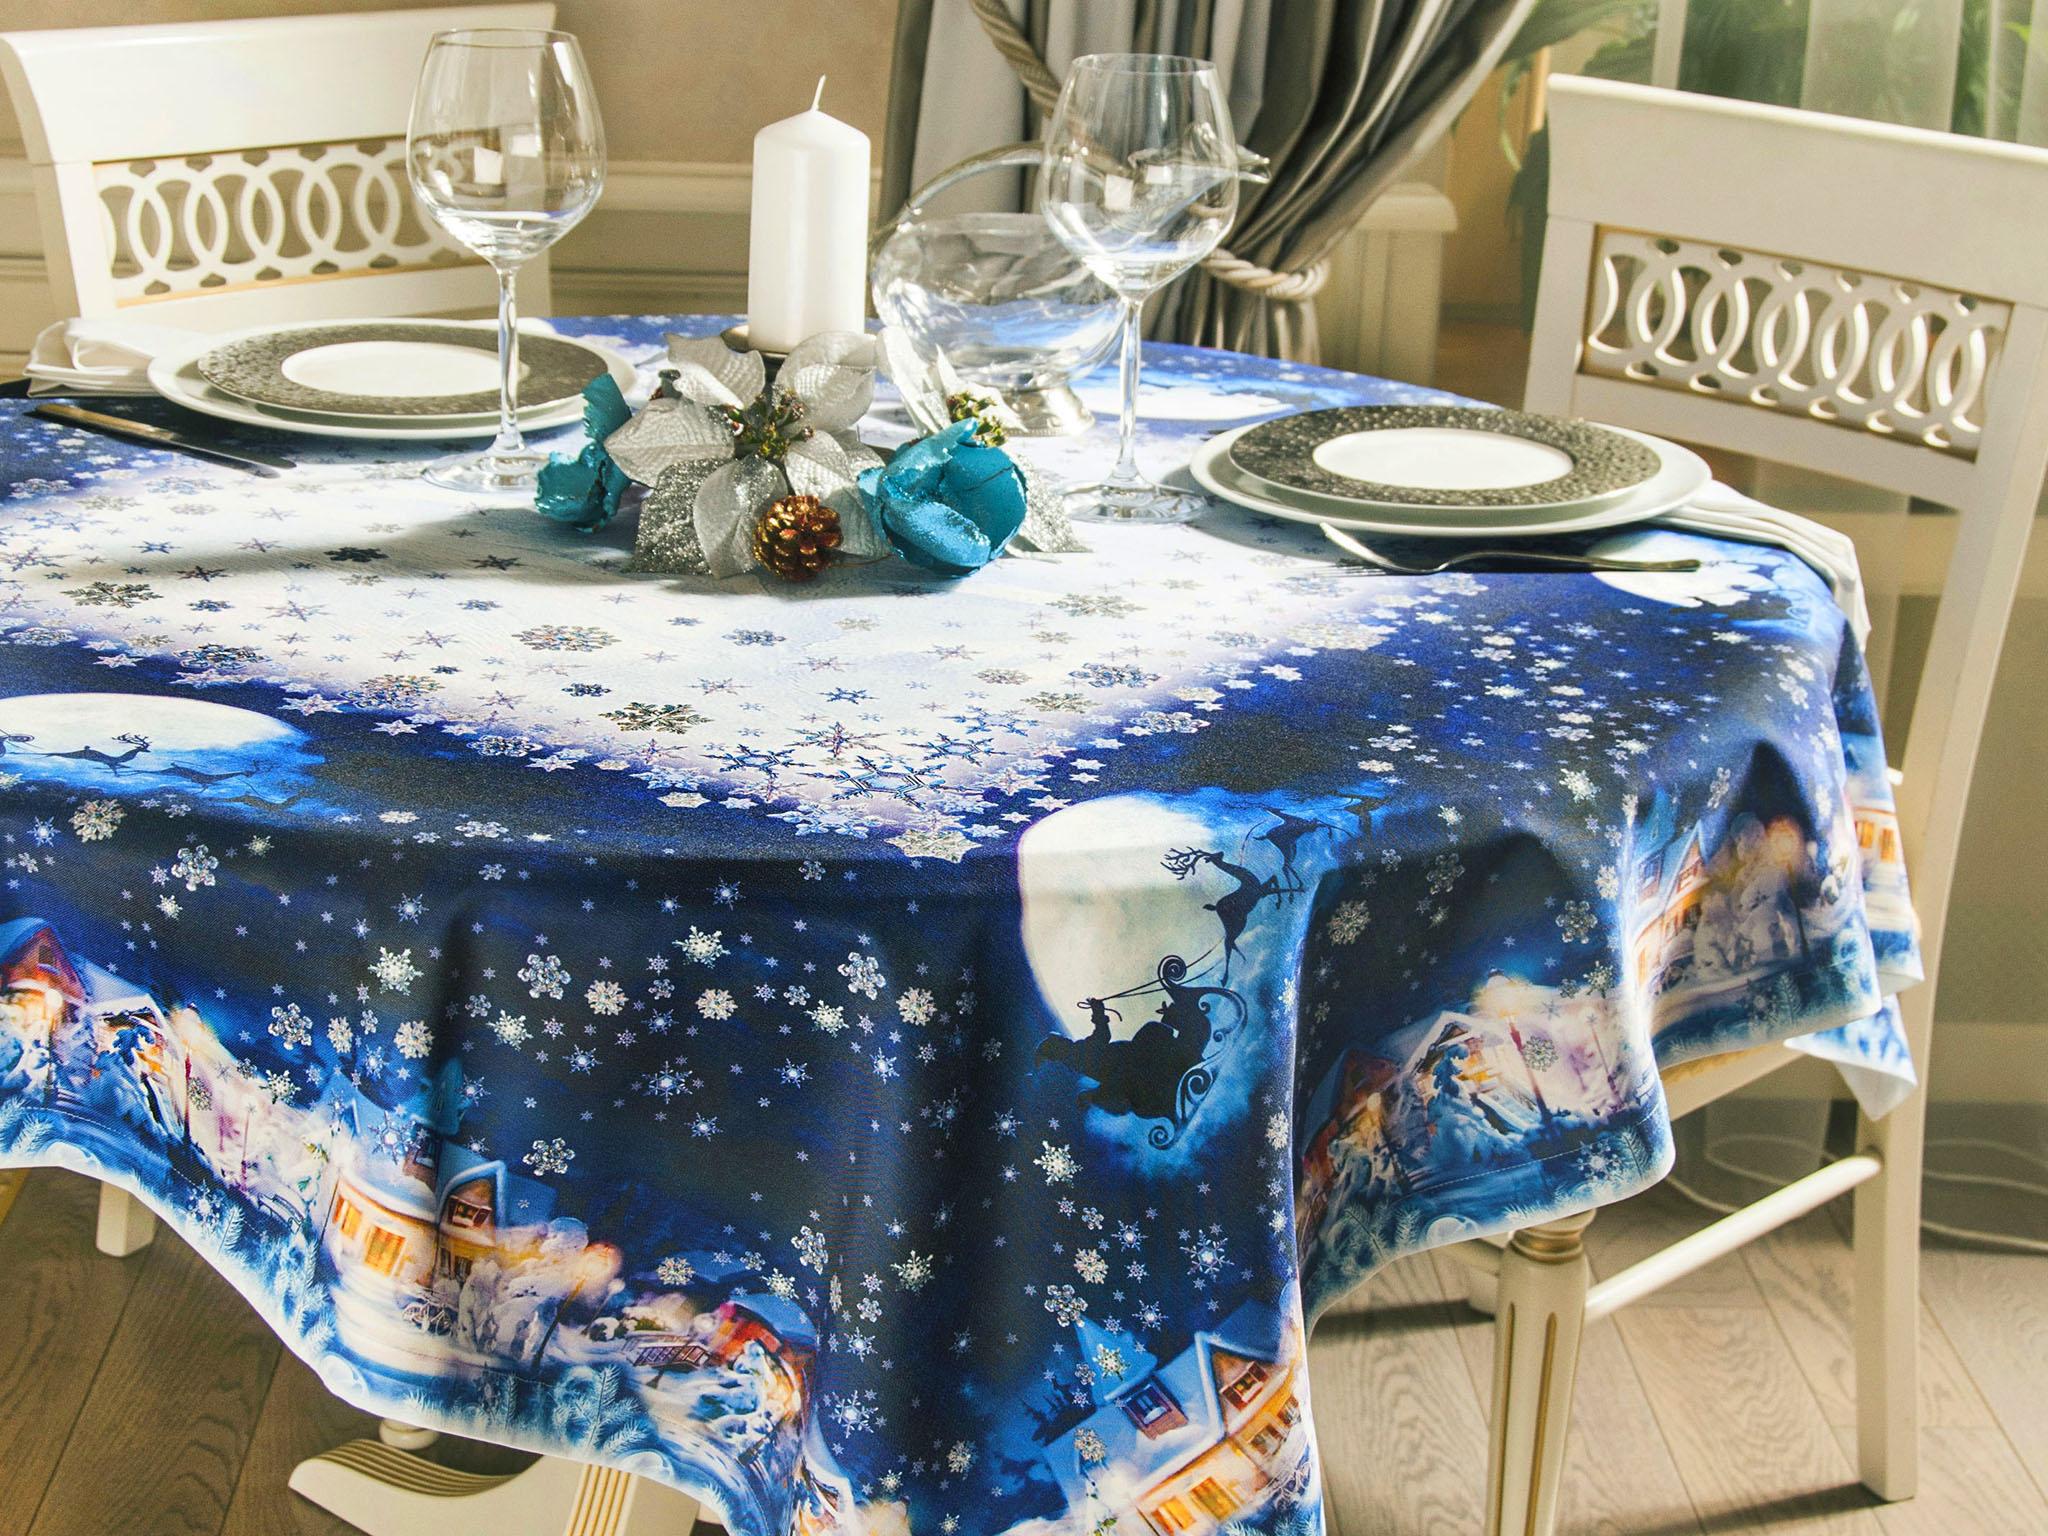 скатерть а новогодний стол синяя